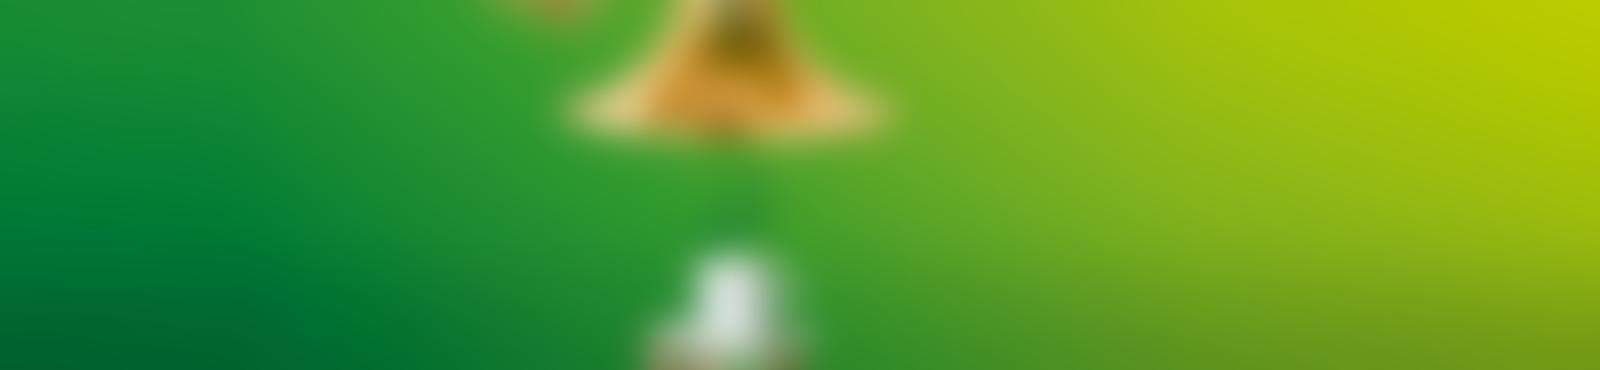 Blurred b477d5b8 1b8a 41d5 a584 62ca0c4a7784